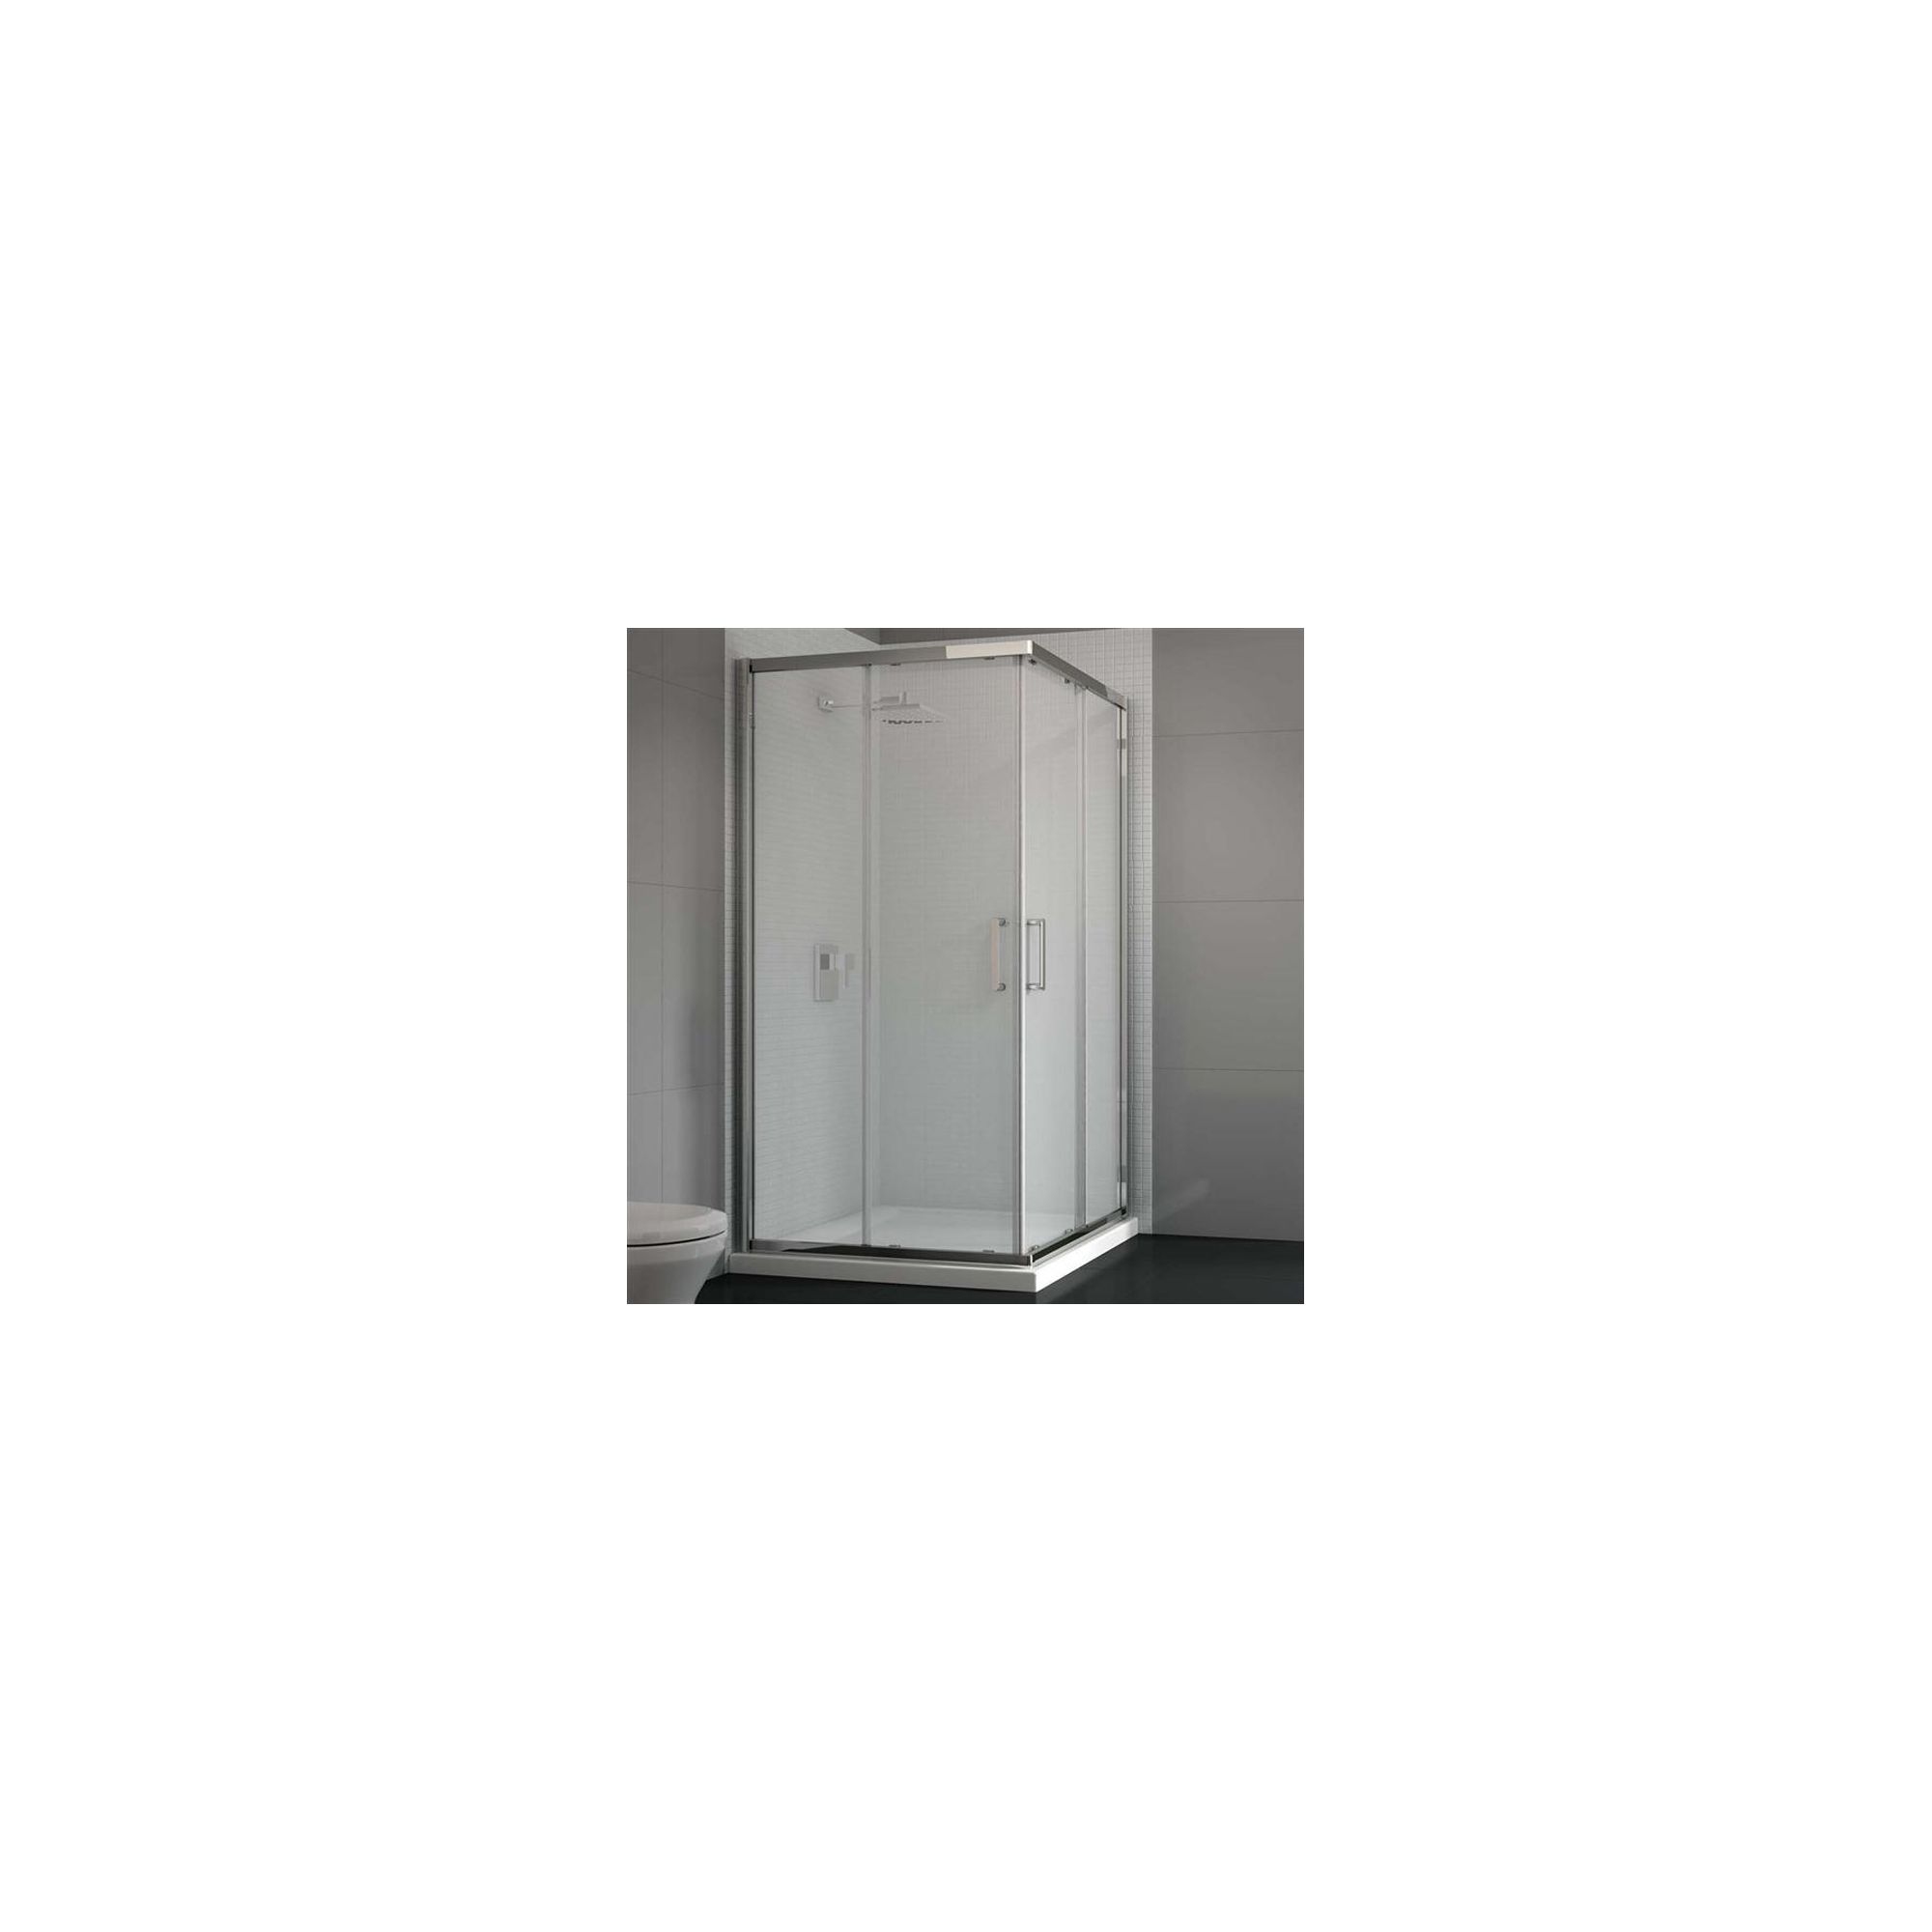 Merlyn Vivid Six Corner Entry Shower Door, 800mm x 800mm, 6mm Glass at Tesco Direct